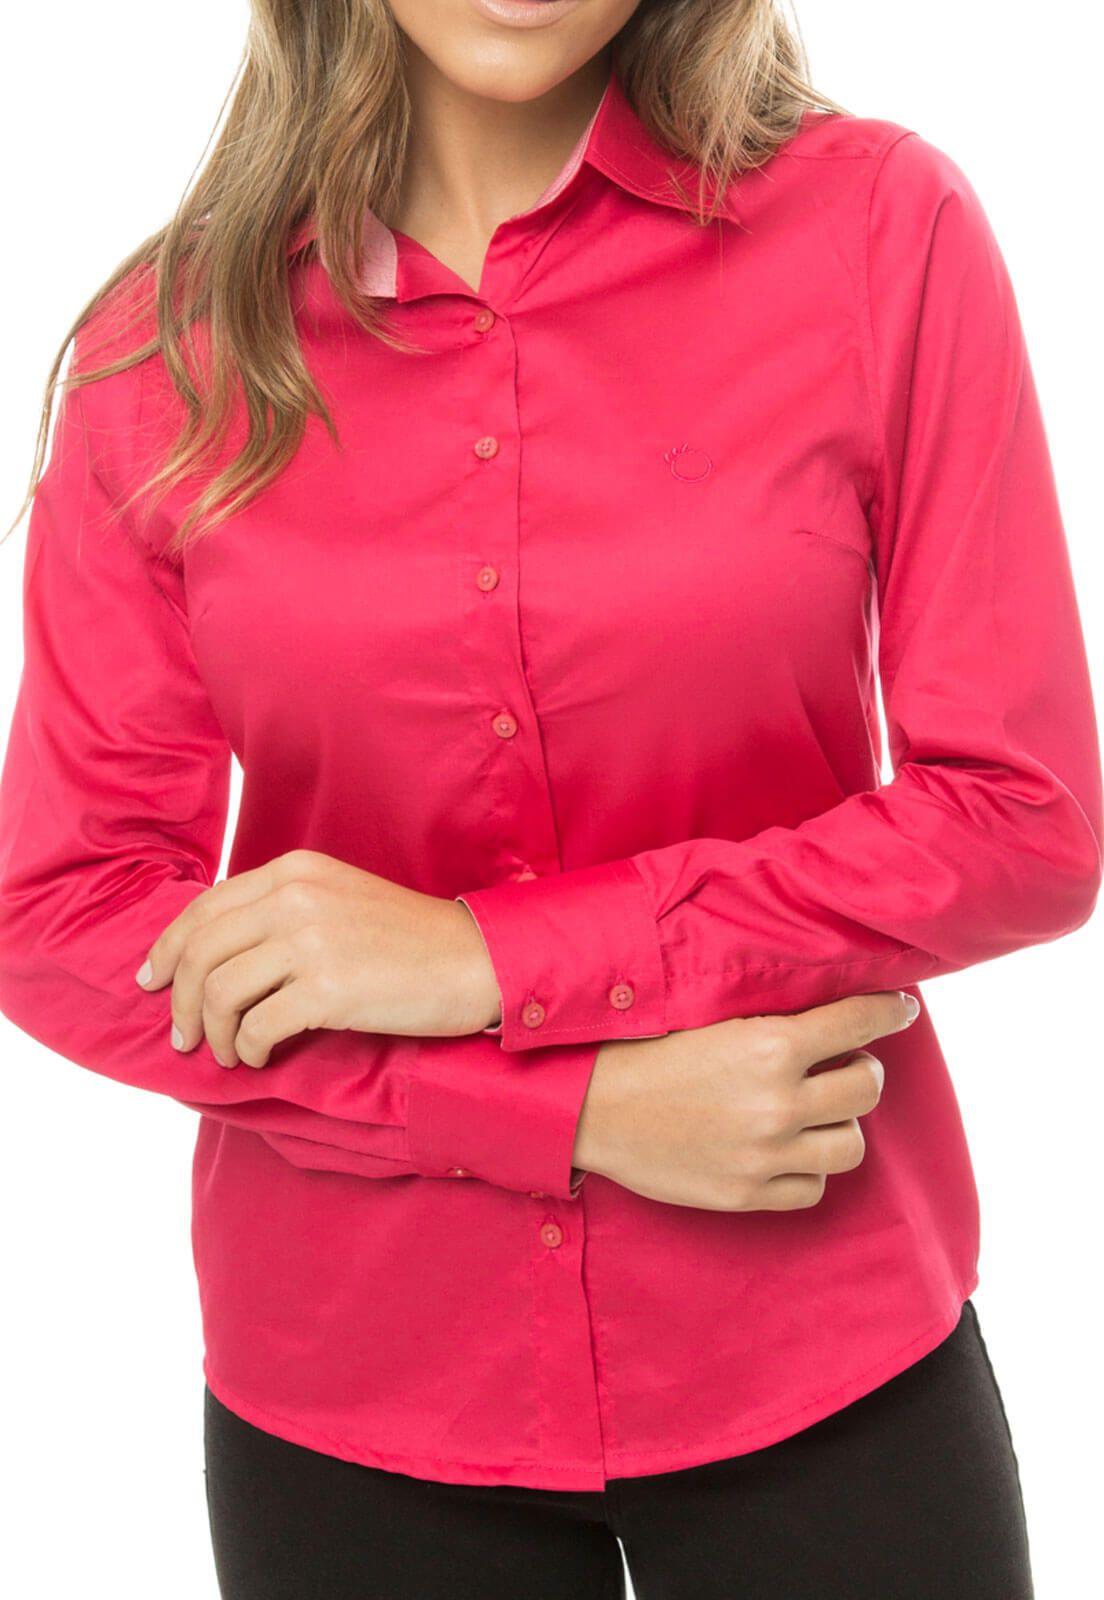 Camisa Olimpo Acetinada 100% Algodão Fio 80 Manga Longa